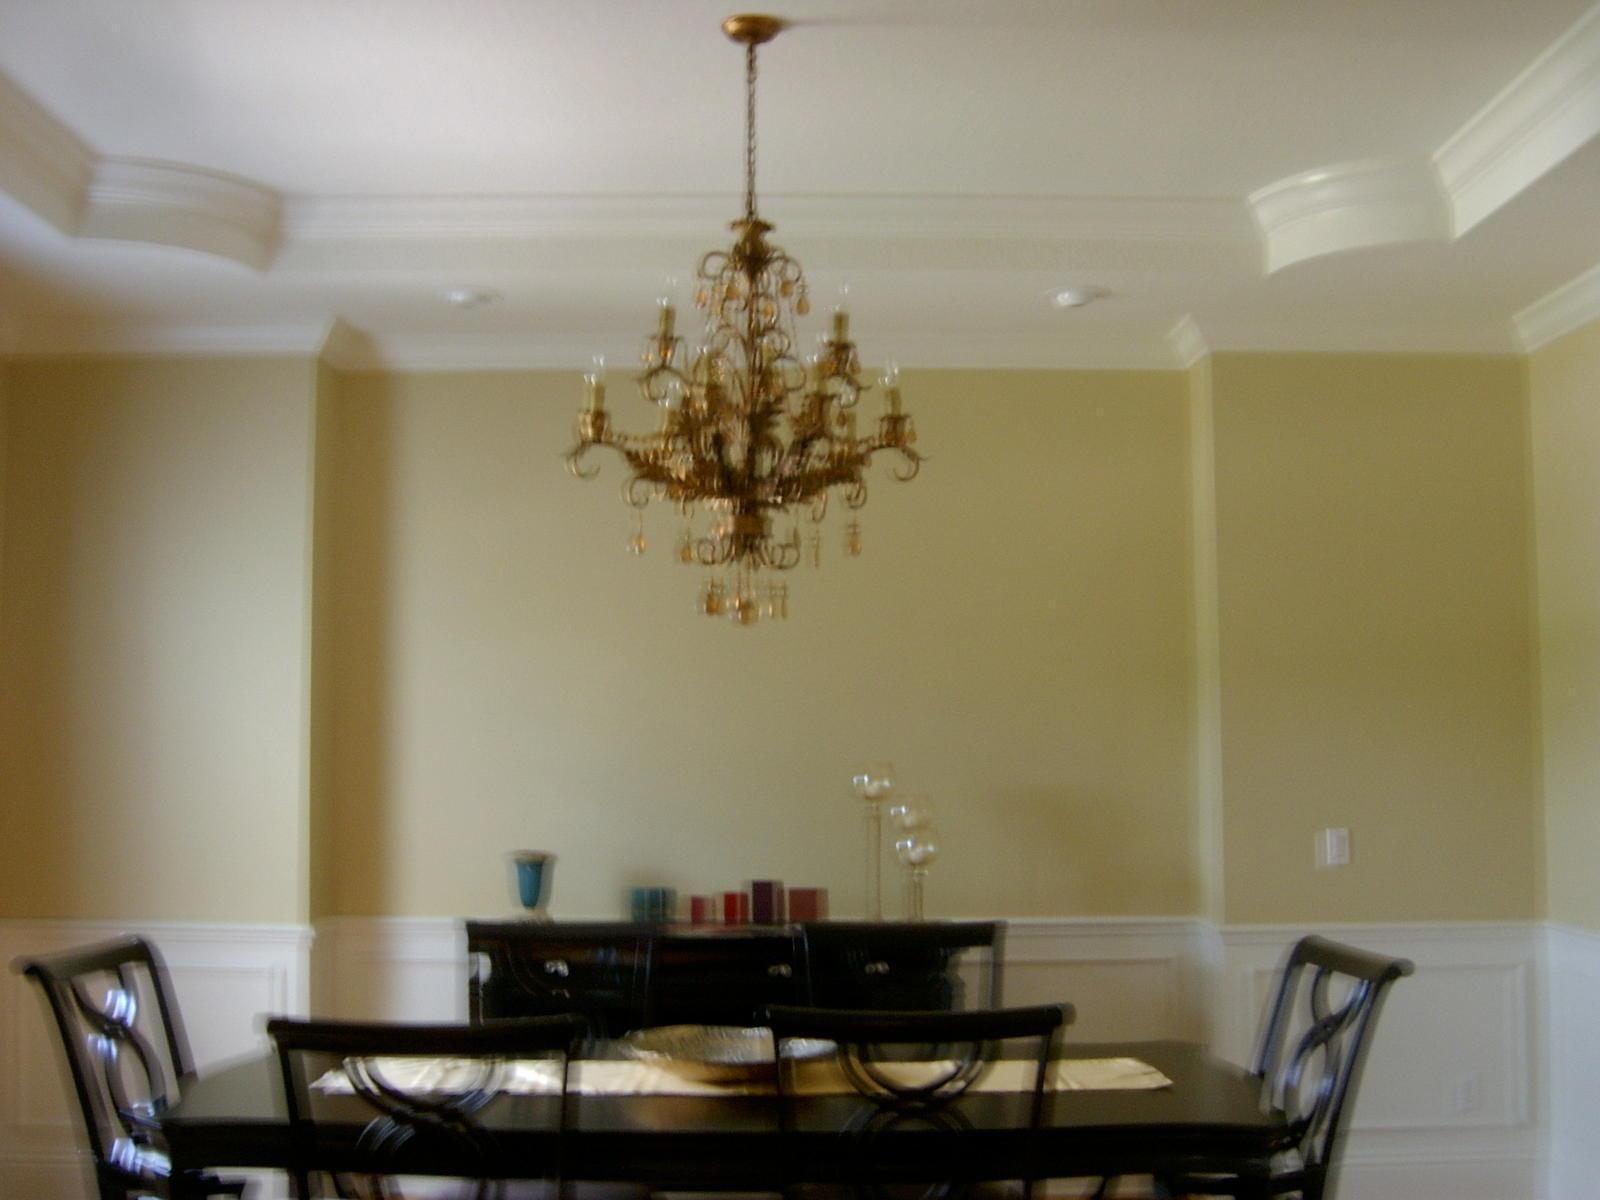 50 Wallpaper Borders For Dining Rooms, Wallpaper Borders For Dining Rooms